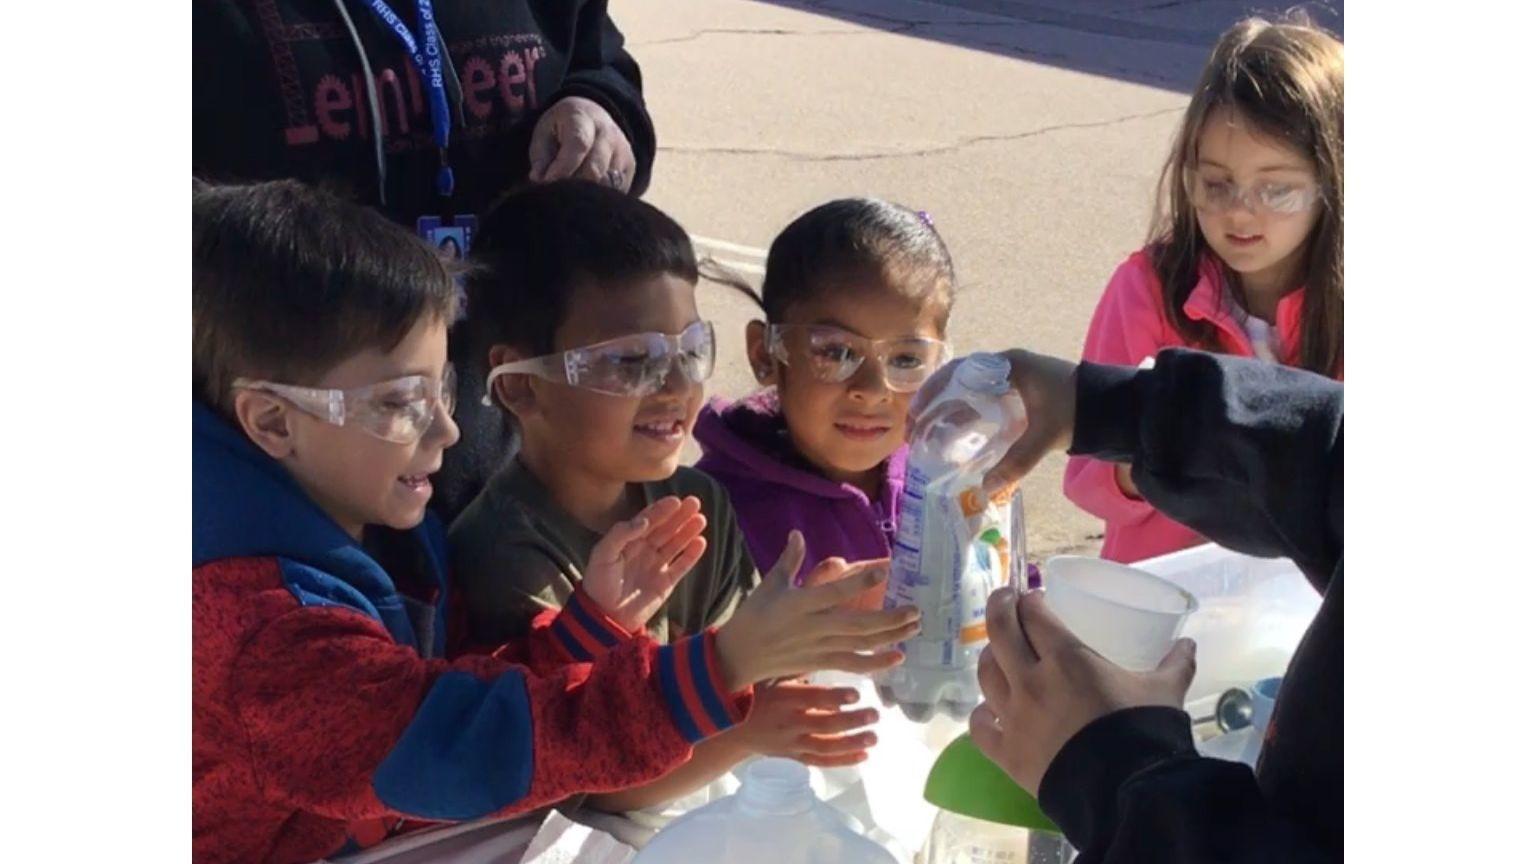 Ramona Elementary School kindergarten students participating in science experiments are Bryan Scanlan, Anthony Patino, Leslie Hernandez-Cruz and Reilly Vermeren.